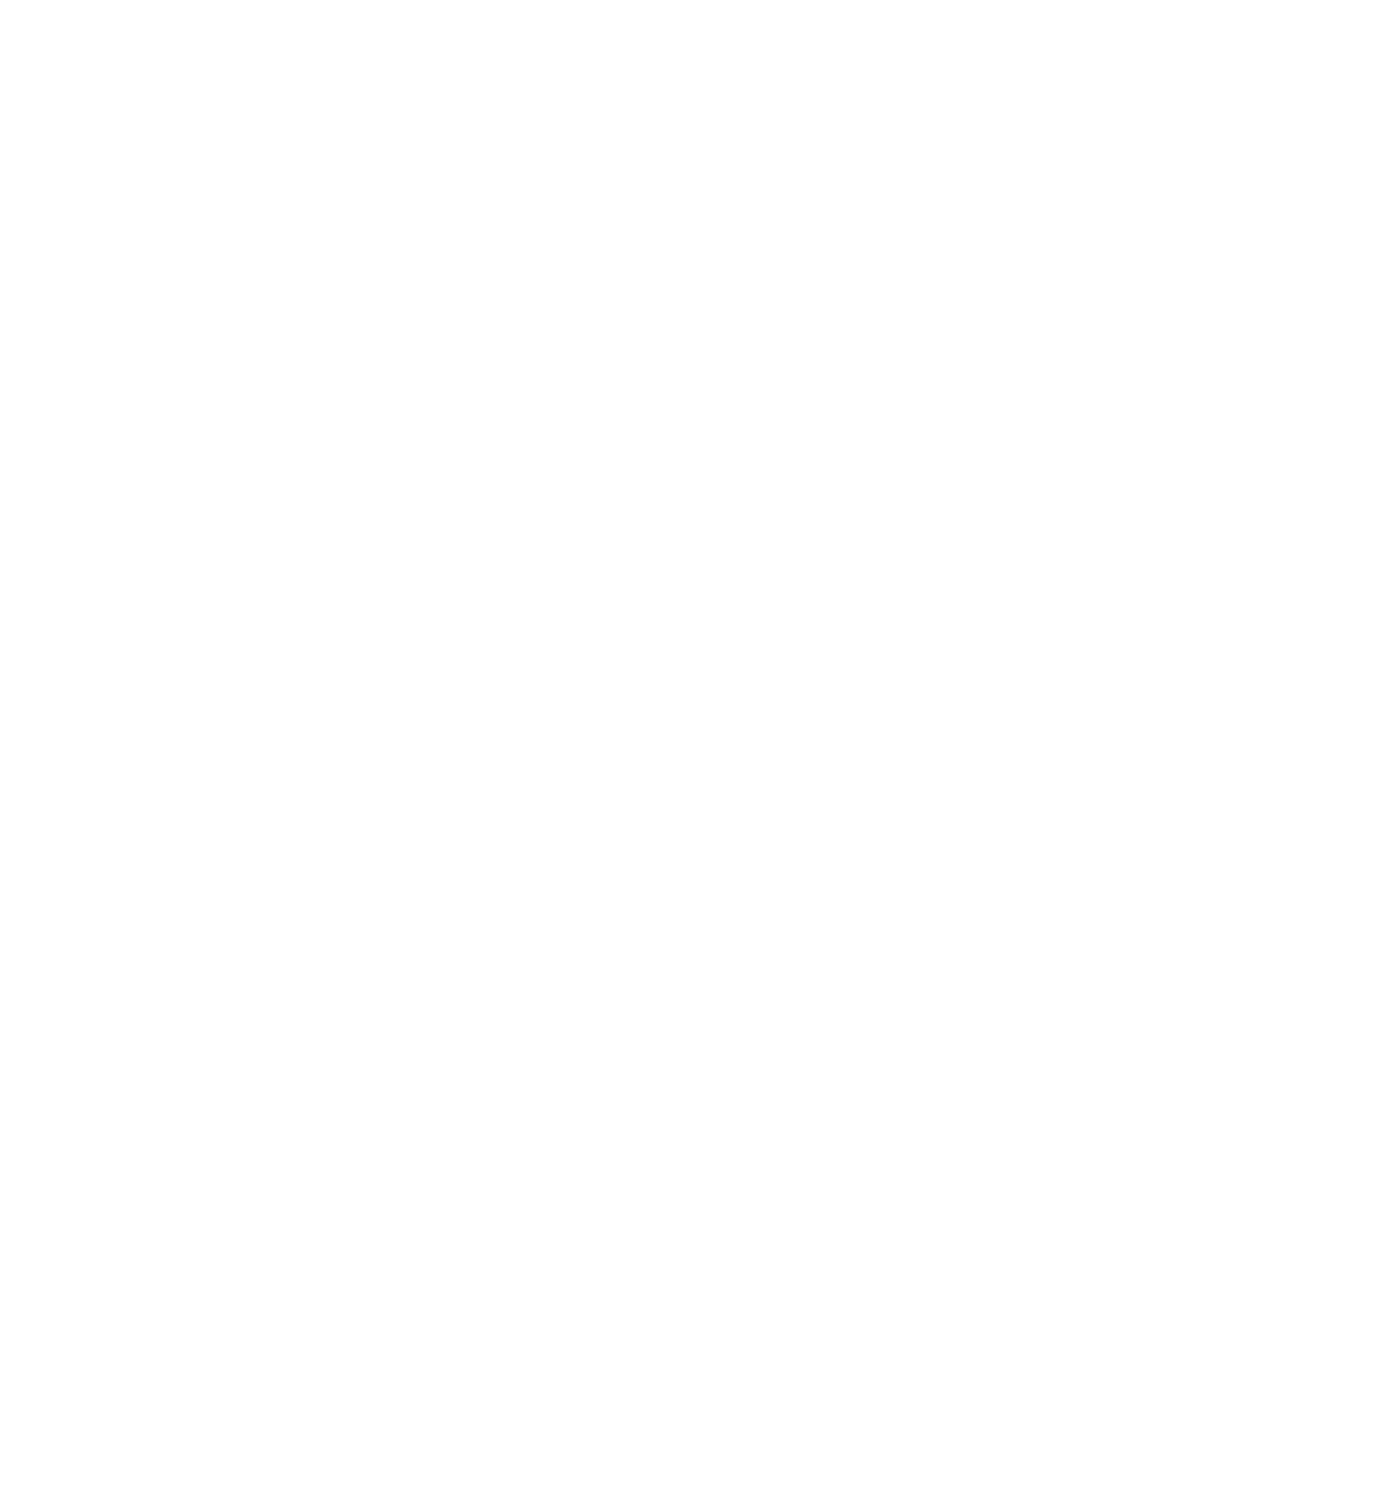 TFHSF_FINAL-03.png